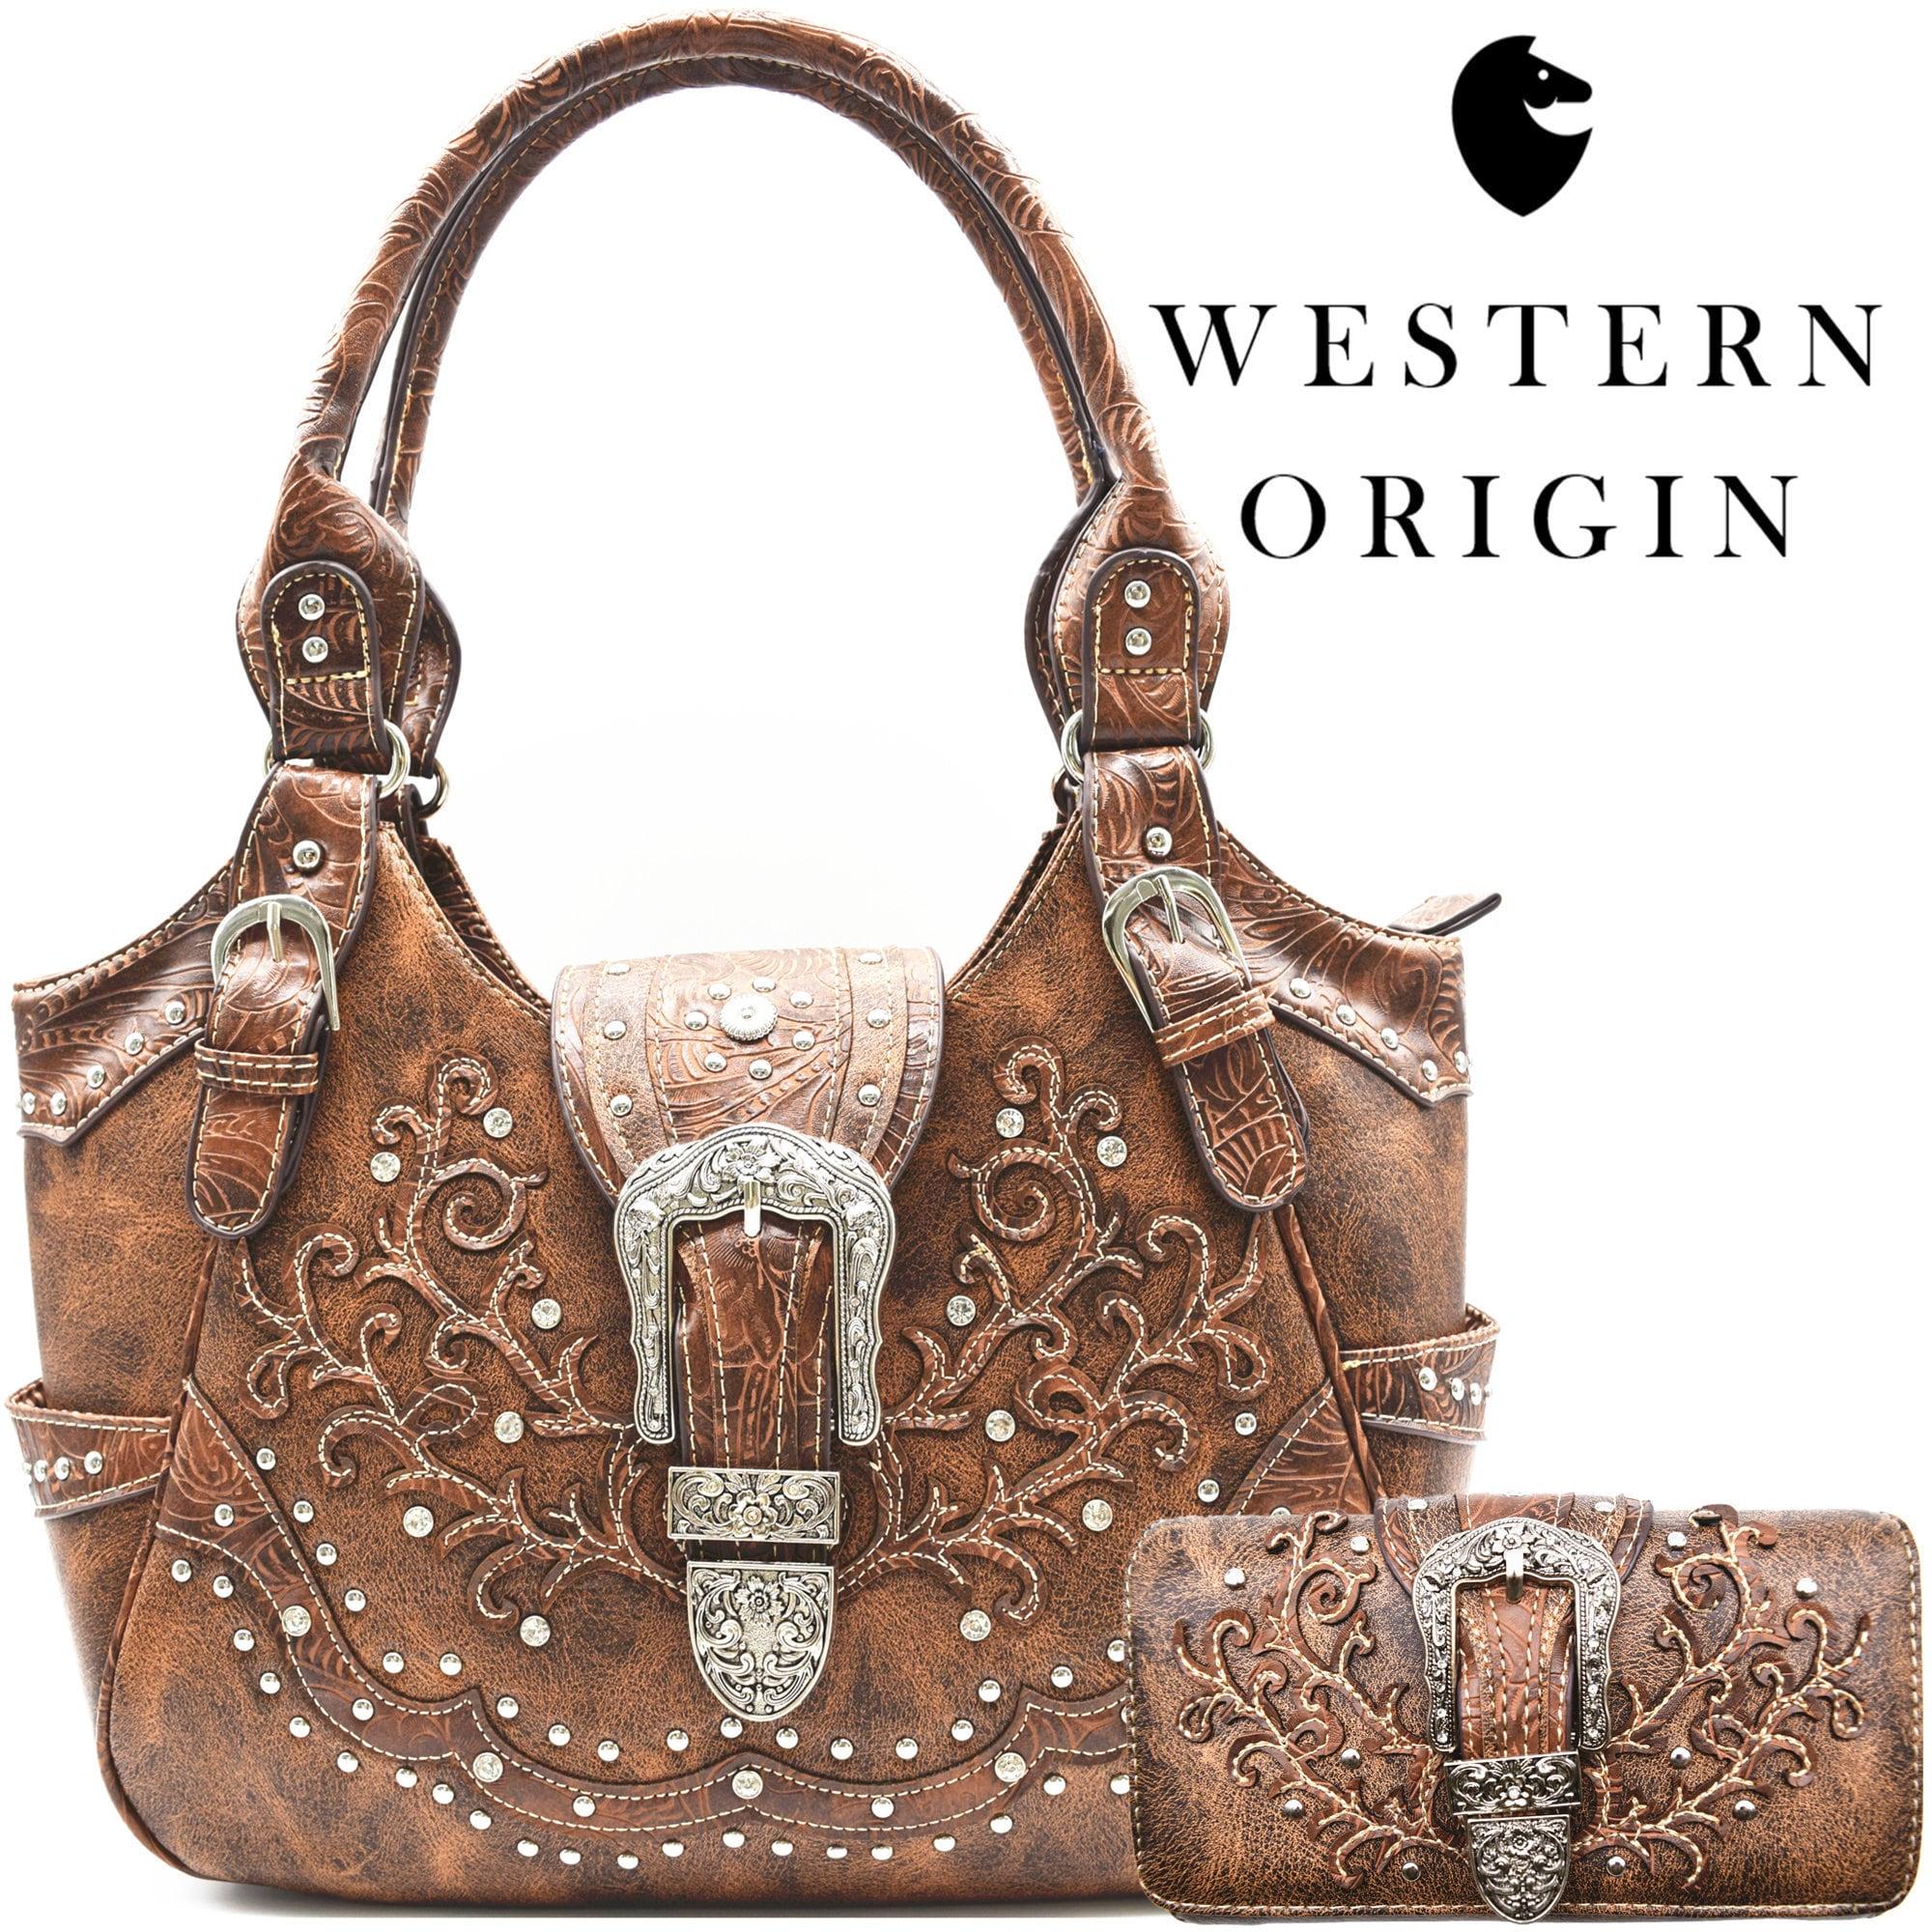 Western Style Concealed Carry Purse Buckle Country Large Tote Handbag Women Shoulder Bag Wallet Set Brown